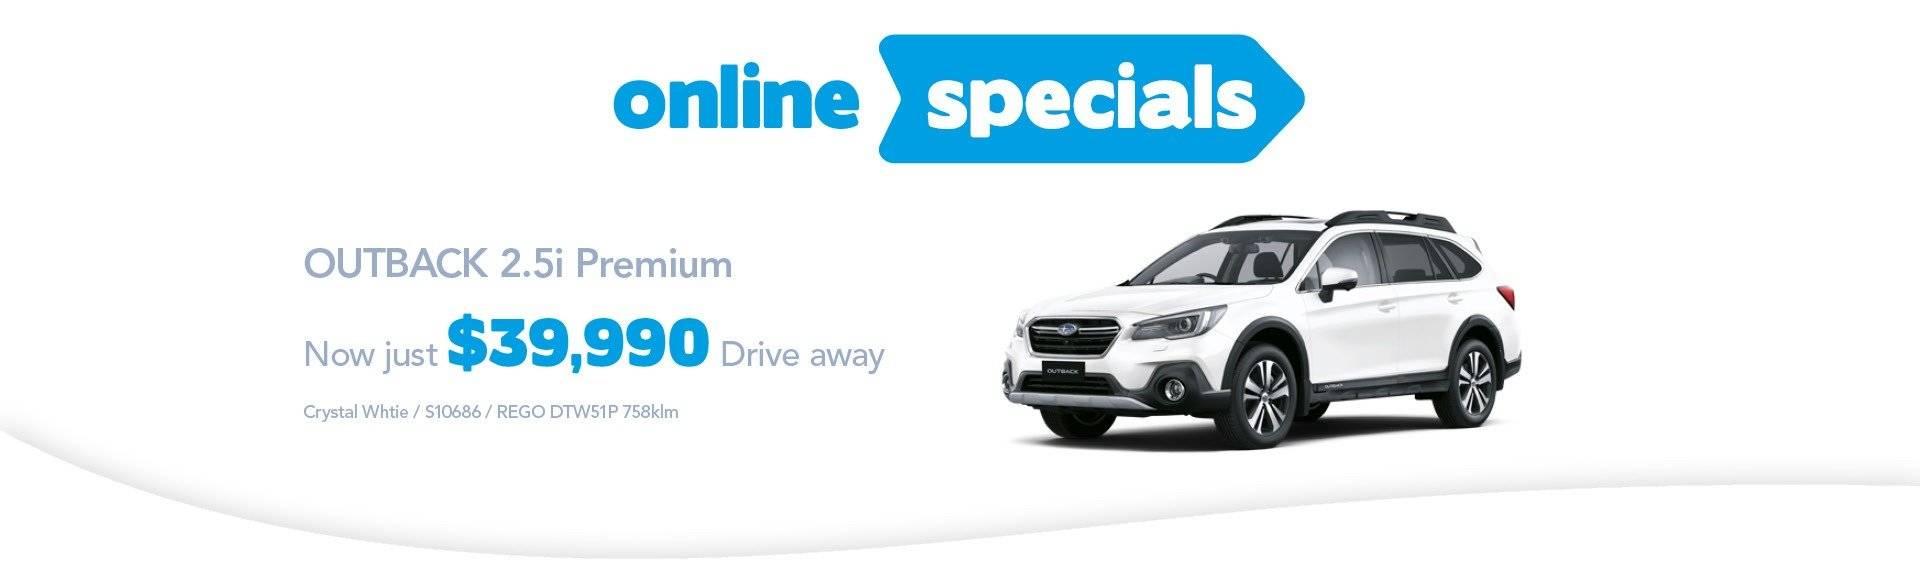 Hunter Subaru Online Specials